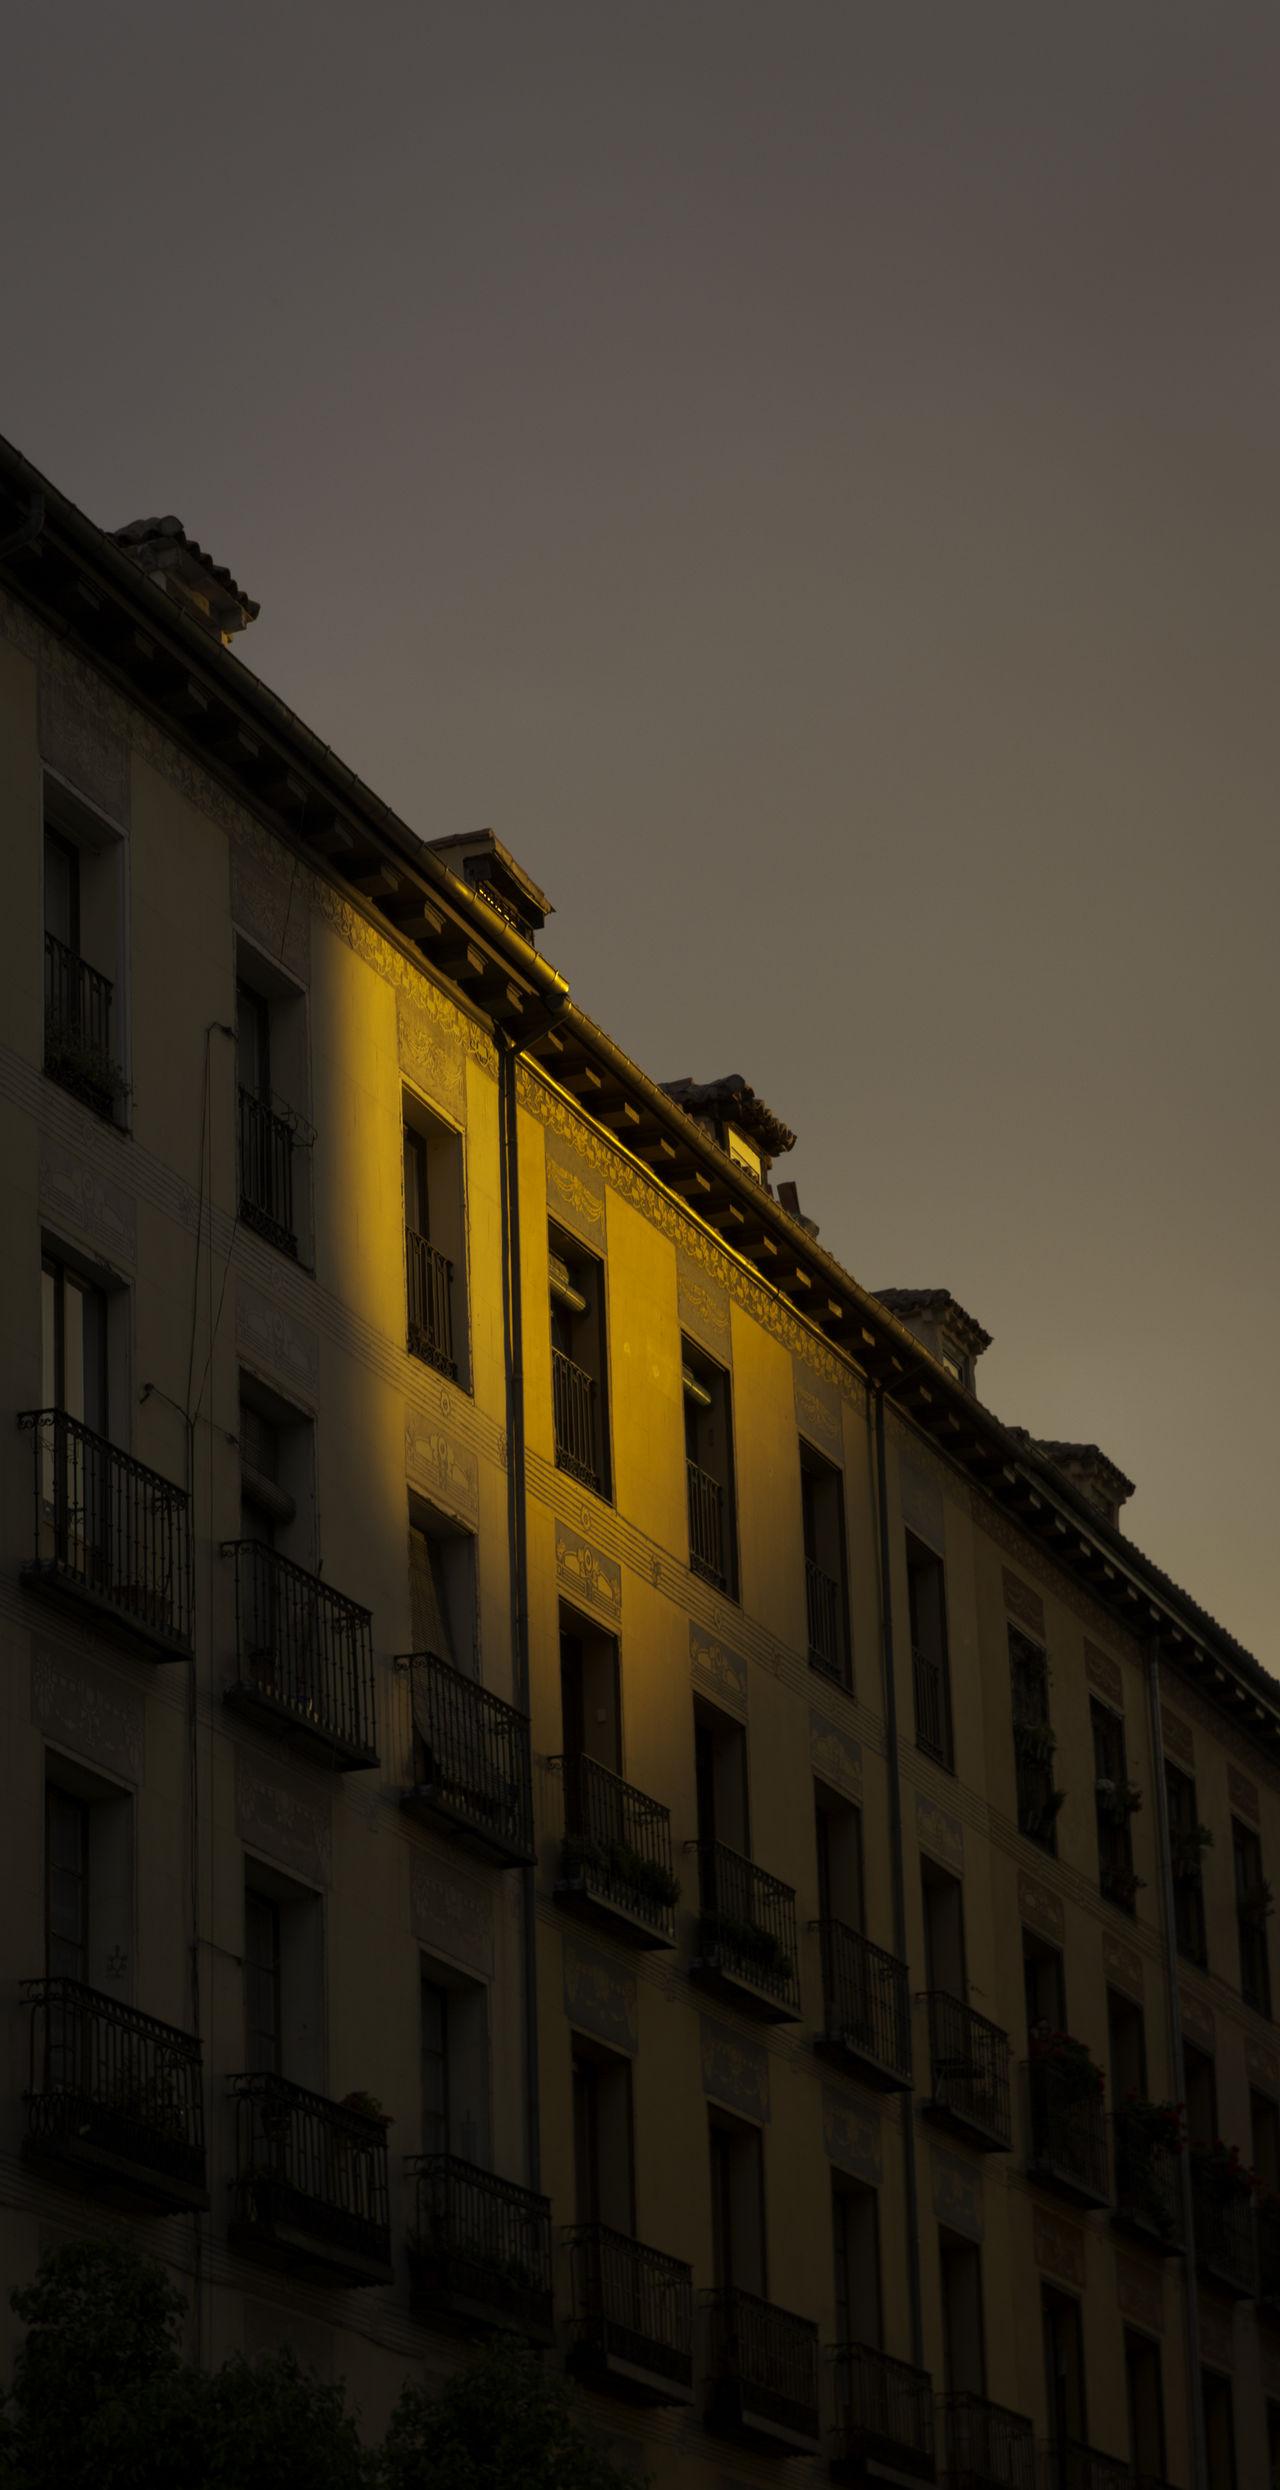 Architecture City City Life Façade Light Spot Low Angle View Madrid Sky Sunset Light The Architect - 2016 EyeEm Awards